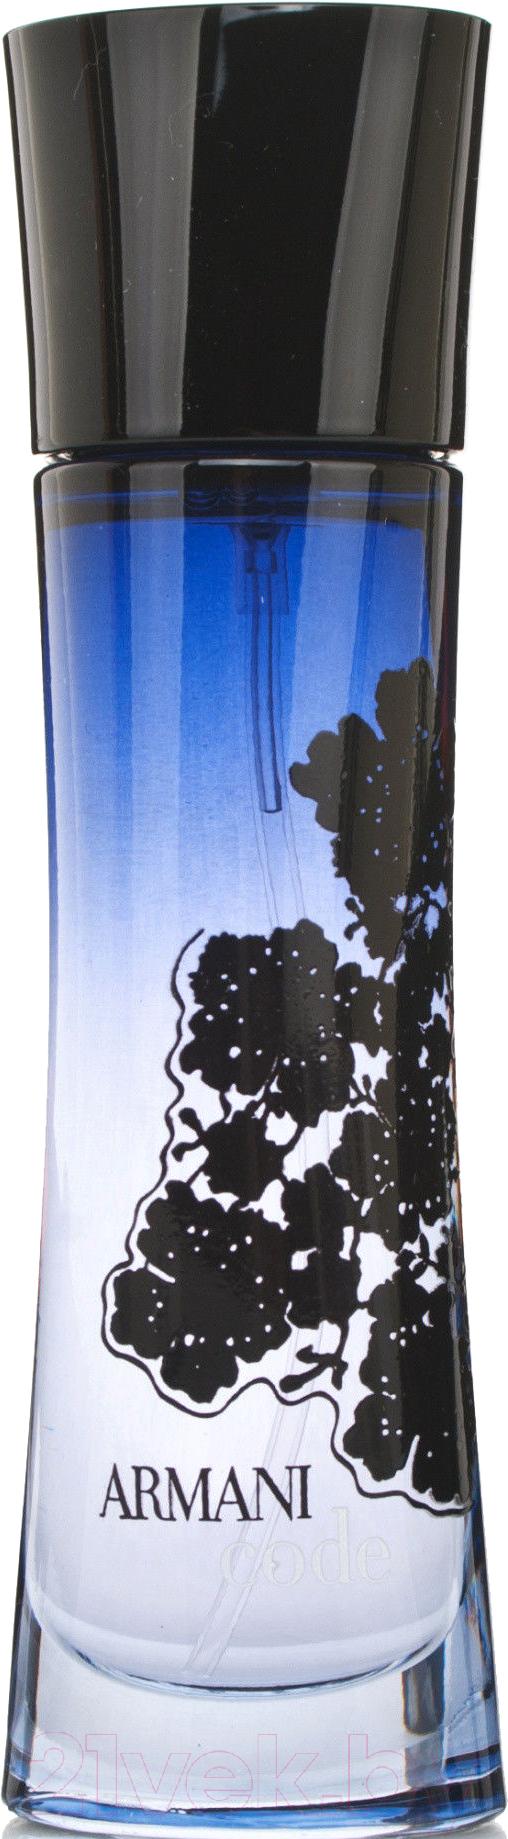 Купить Парфюмерная вода Giorgio Armani, Code Pour Femme (30мл), Италия, Code (Giorgio Armani)